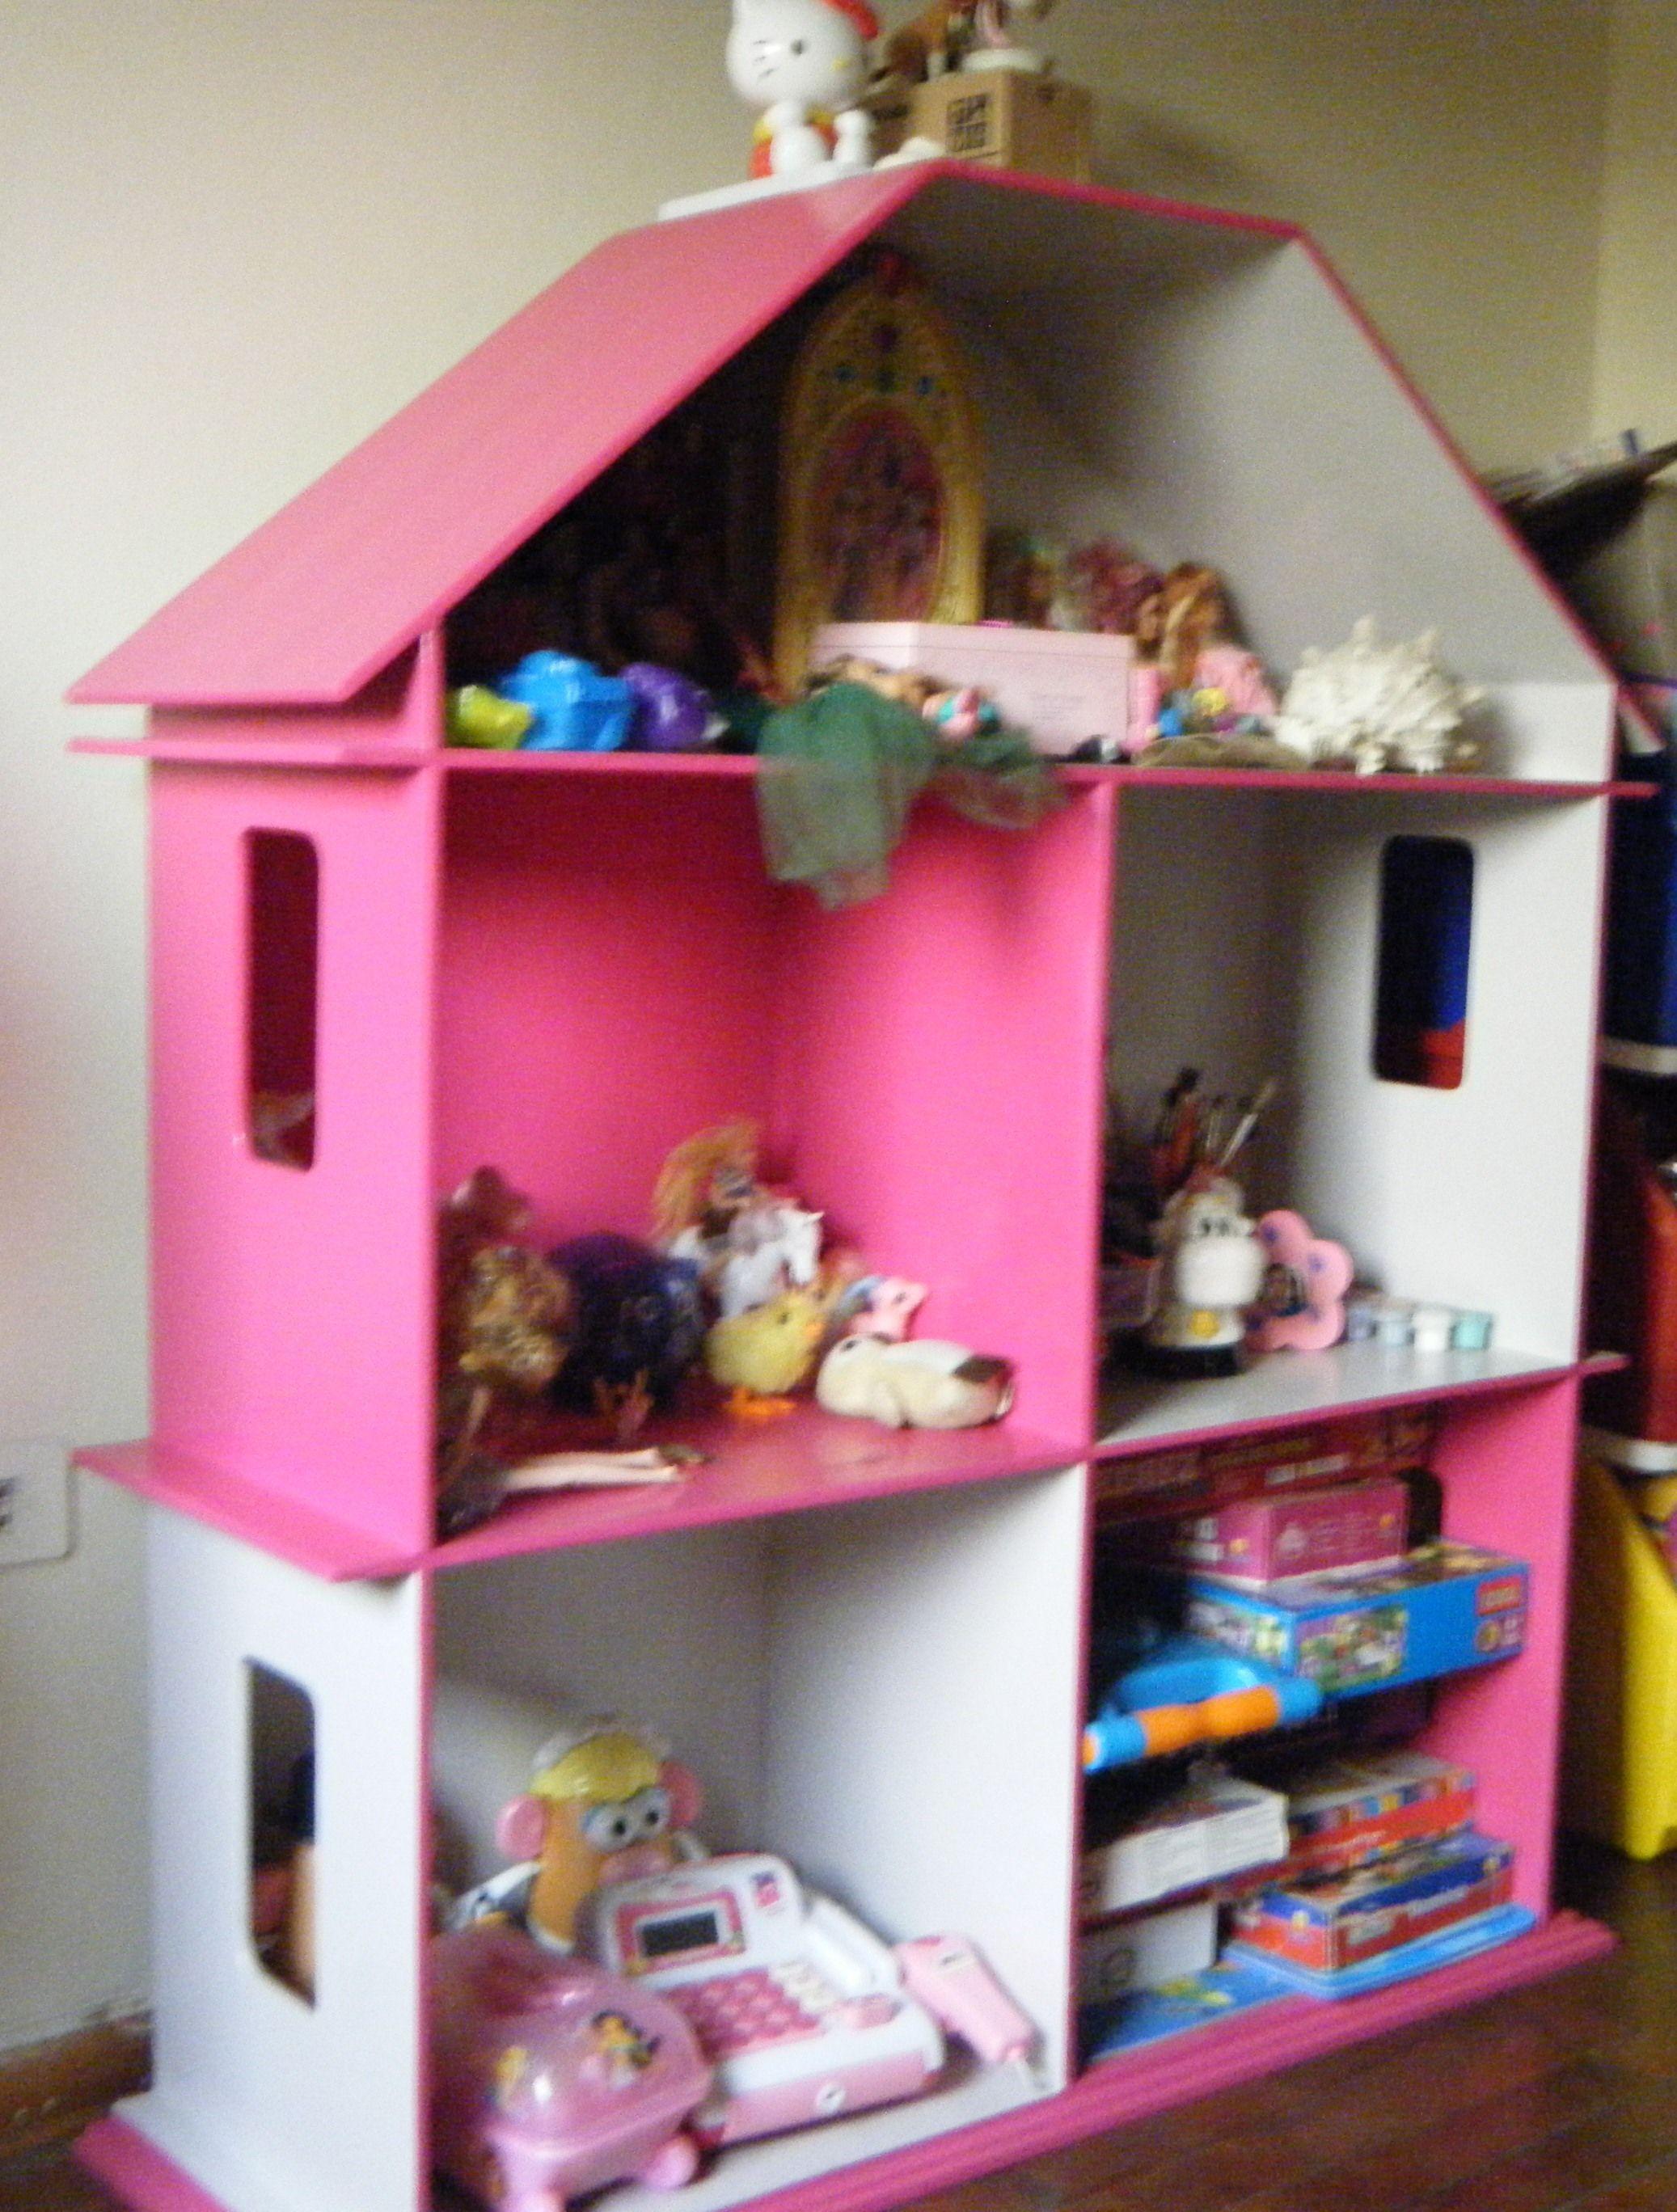 Casita organizador de juguetes para ni a organizar - Estantes para juguetes ...